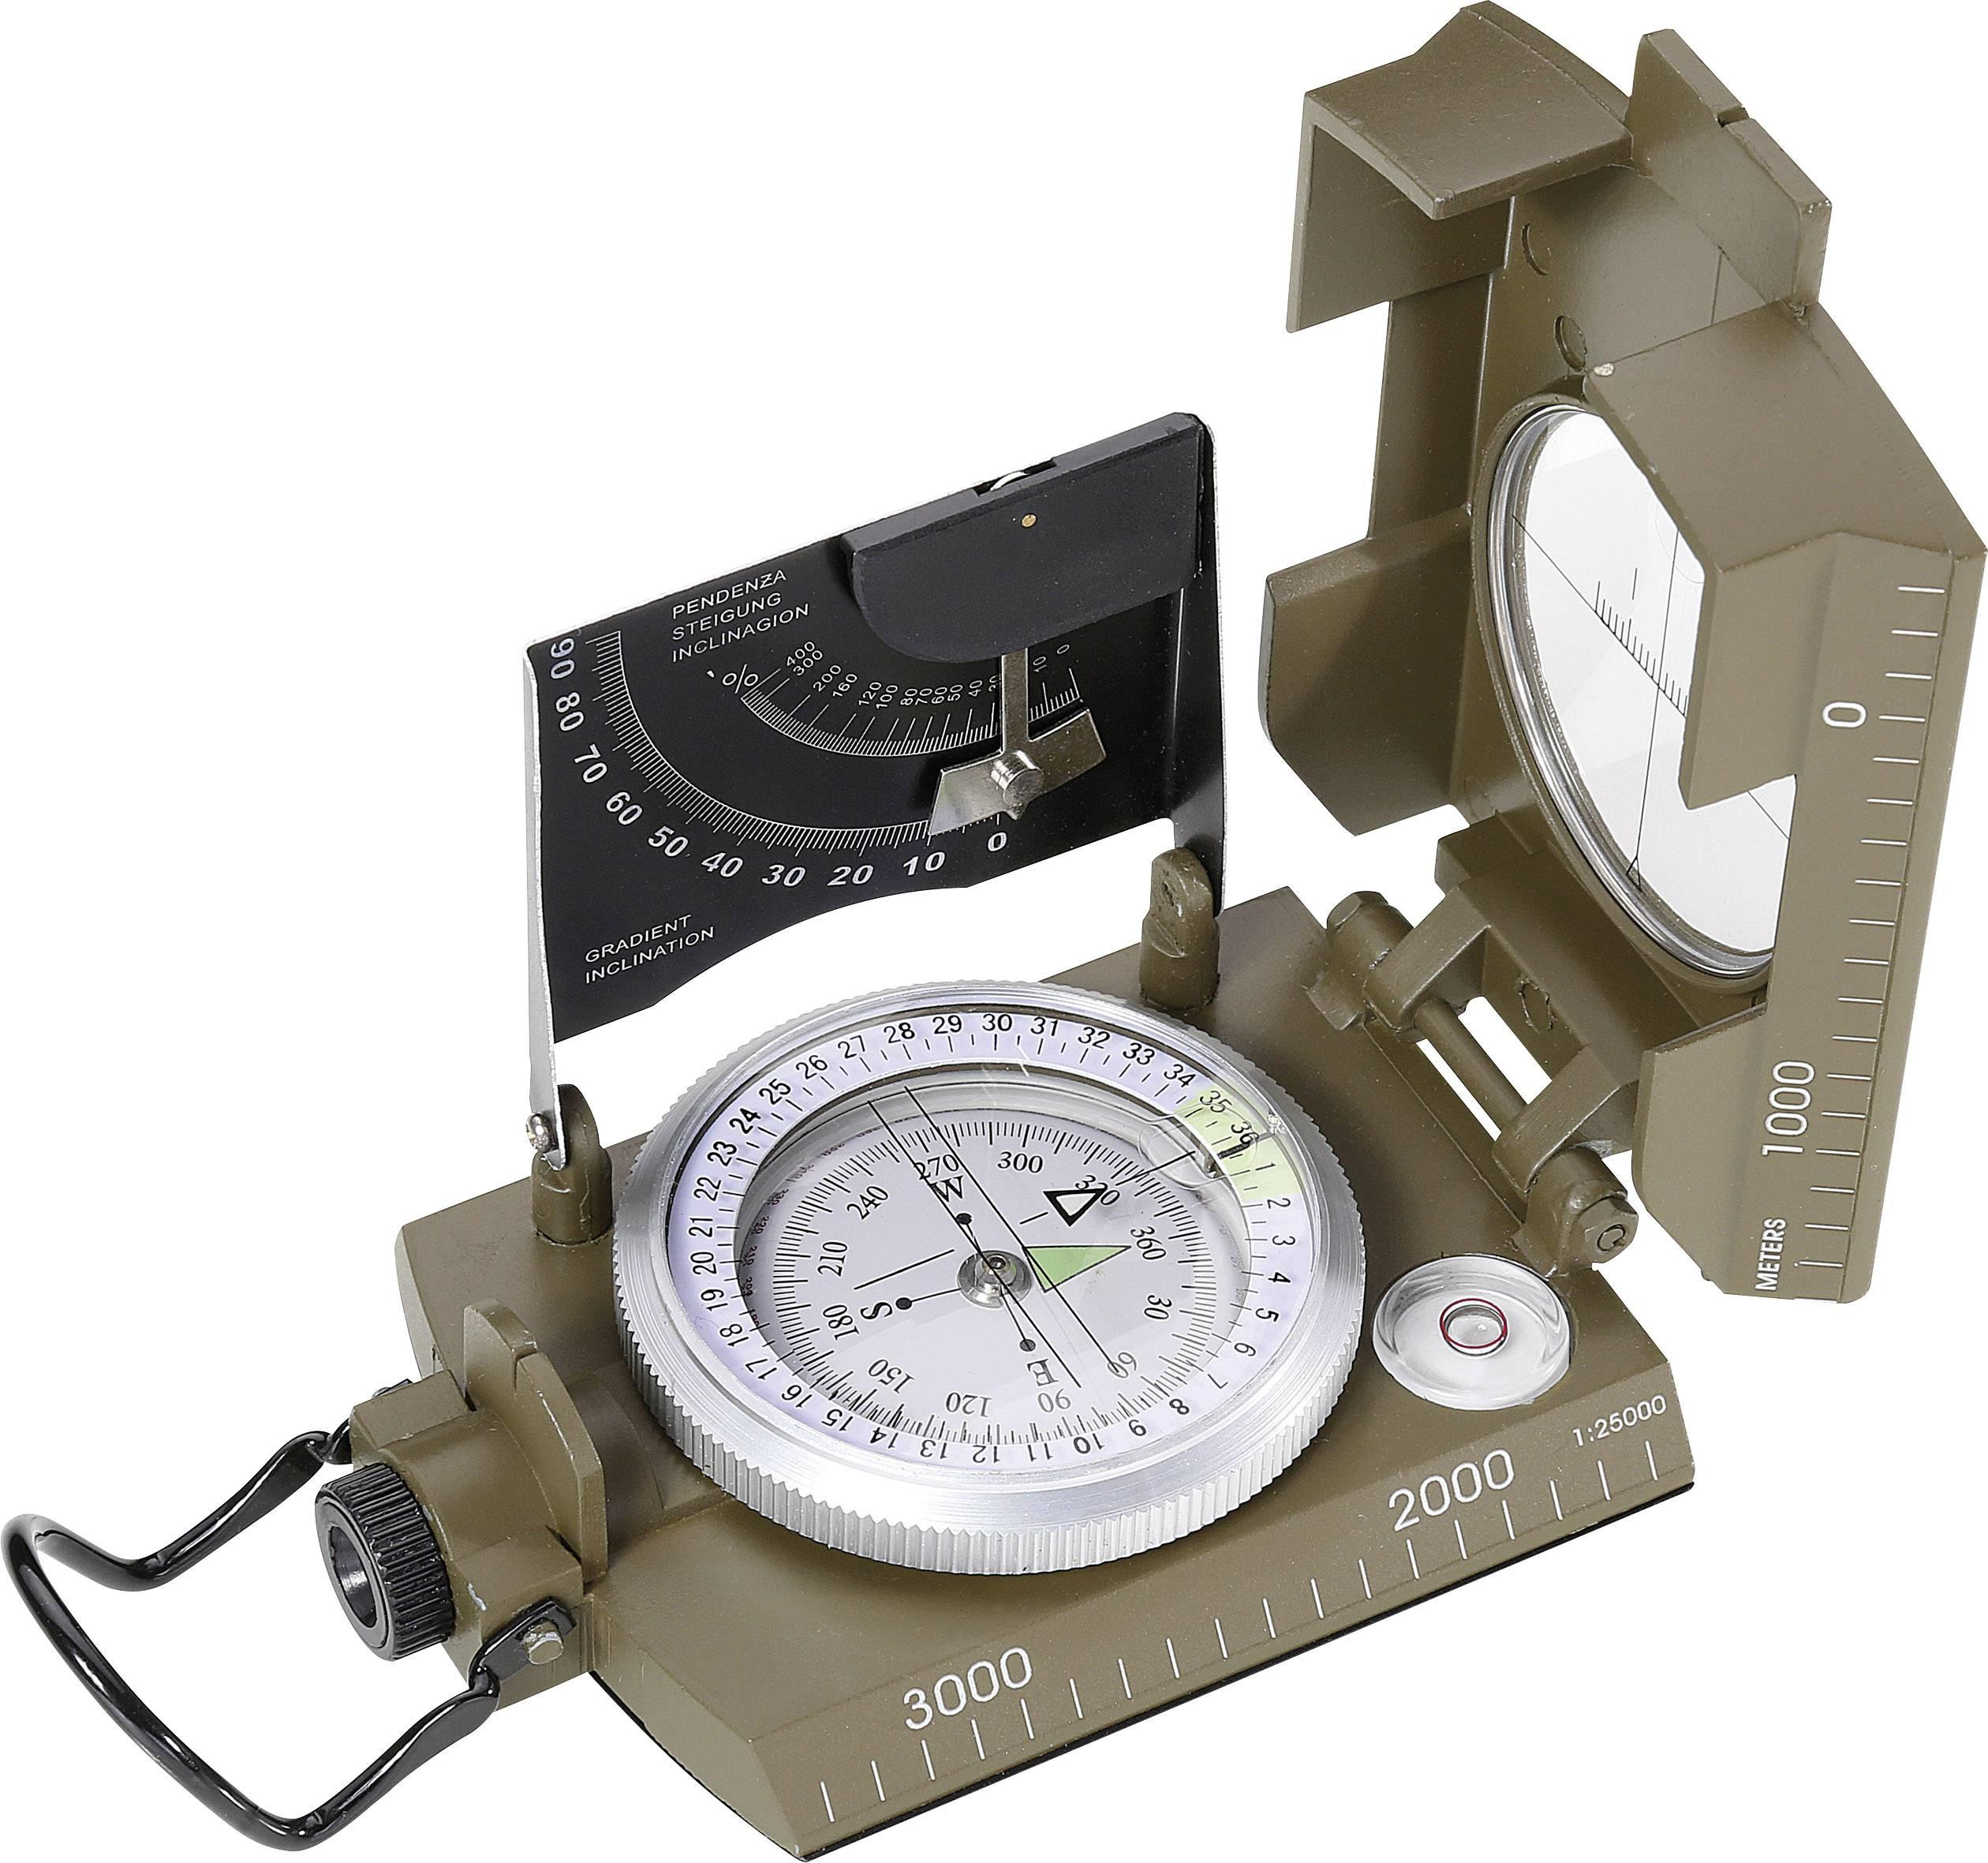 Kompas Herbertz 700500